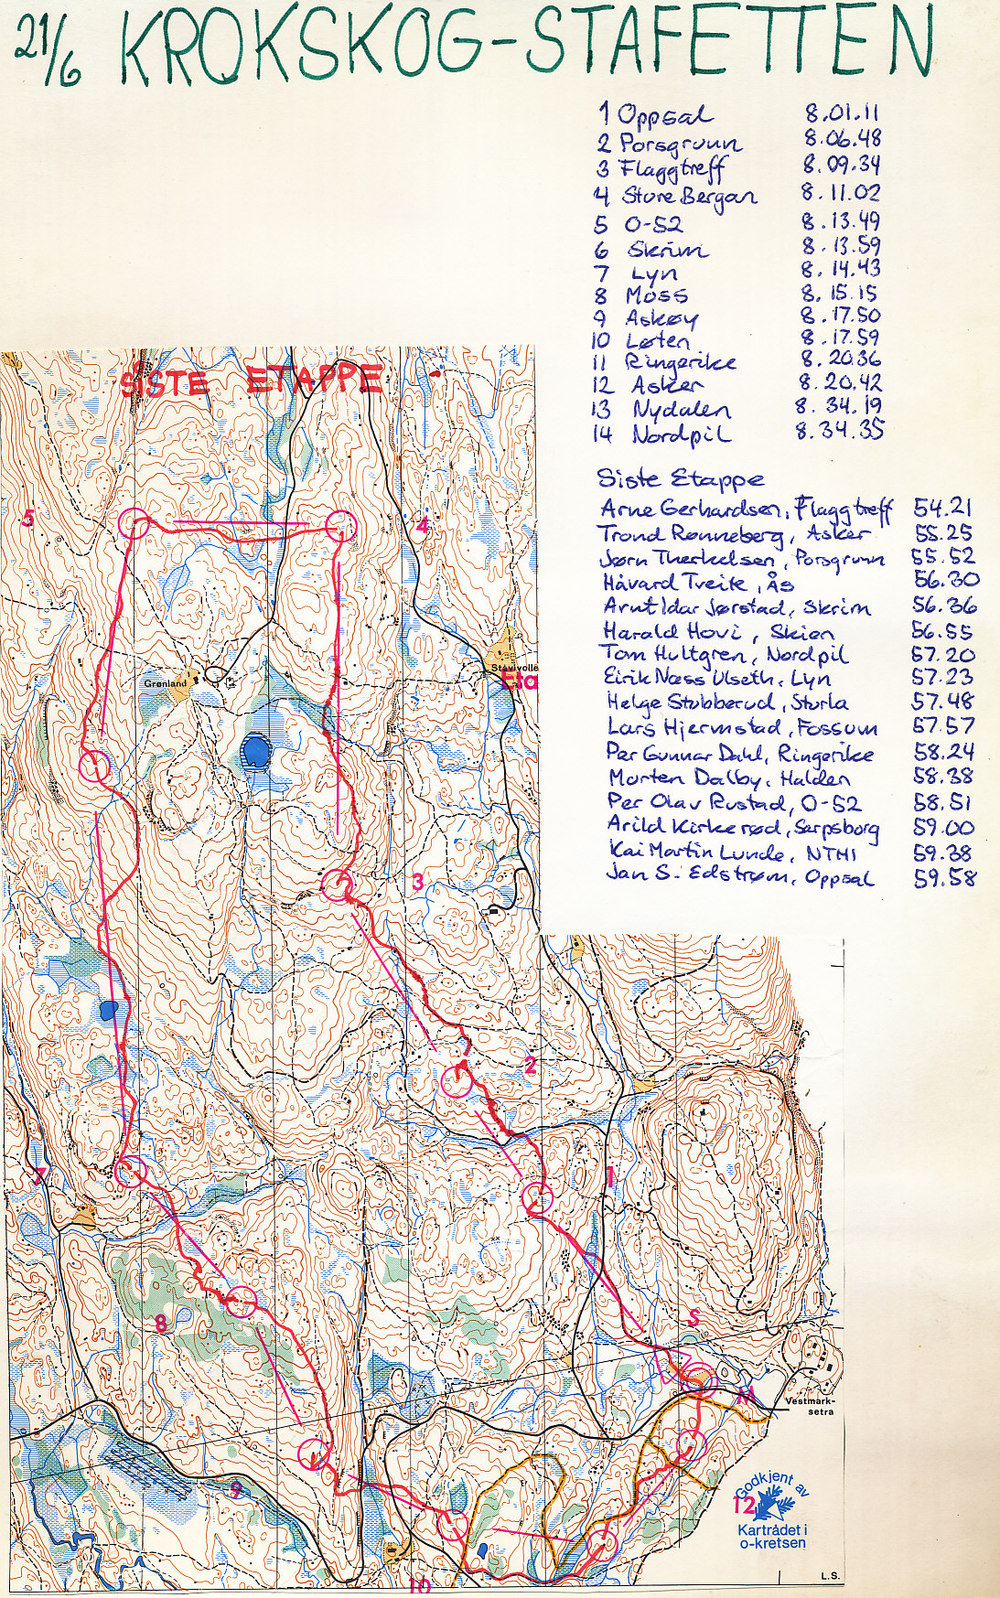 Siste etappe 1981